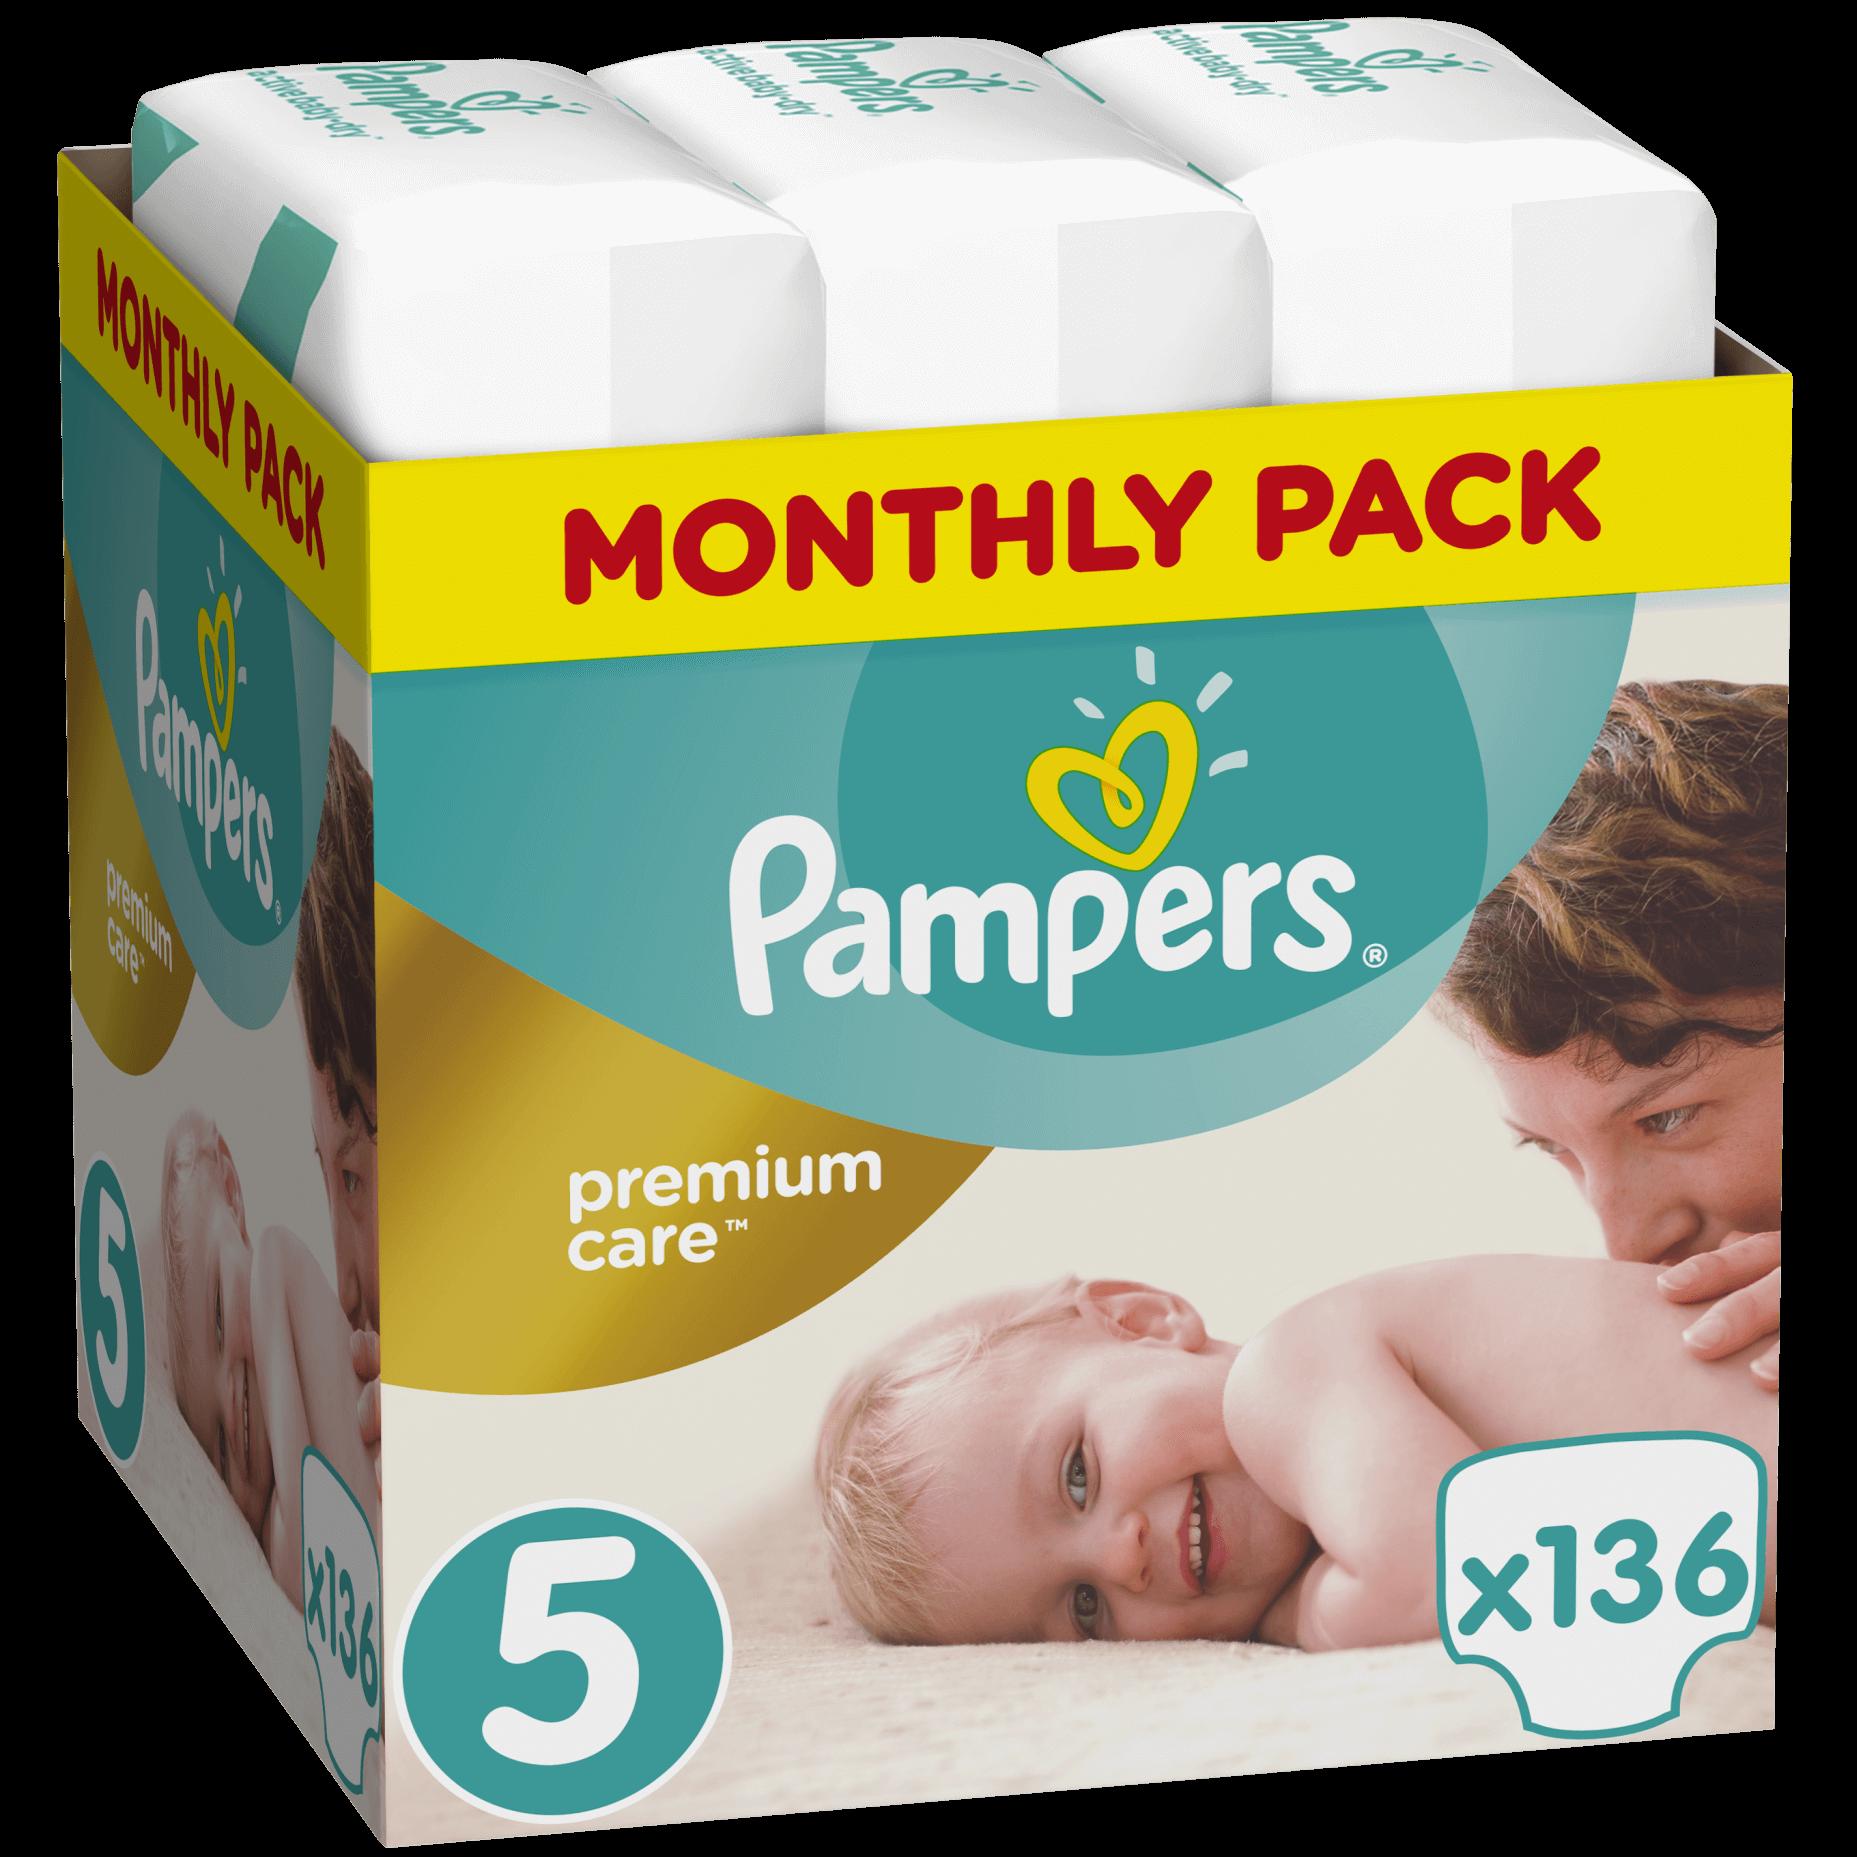 Pampers Premium Care Monthly Pack No5 (11-18kg) 136 πάνες, μόνο 0,33€ / πάνα μητέρα παιδί   περιποίηση για το μωρό   πάνες για το μωρό